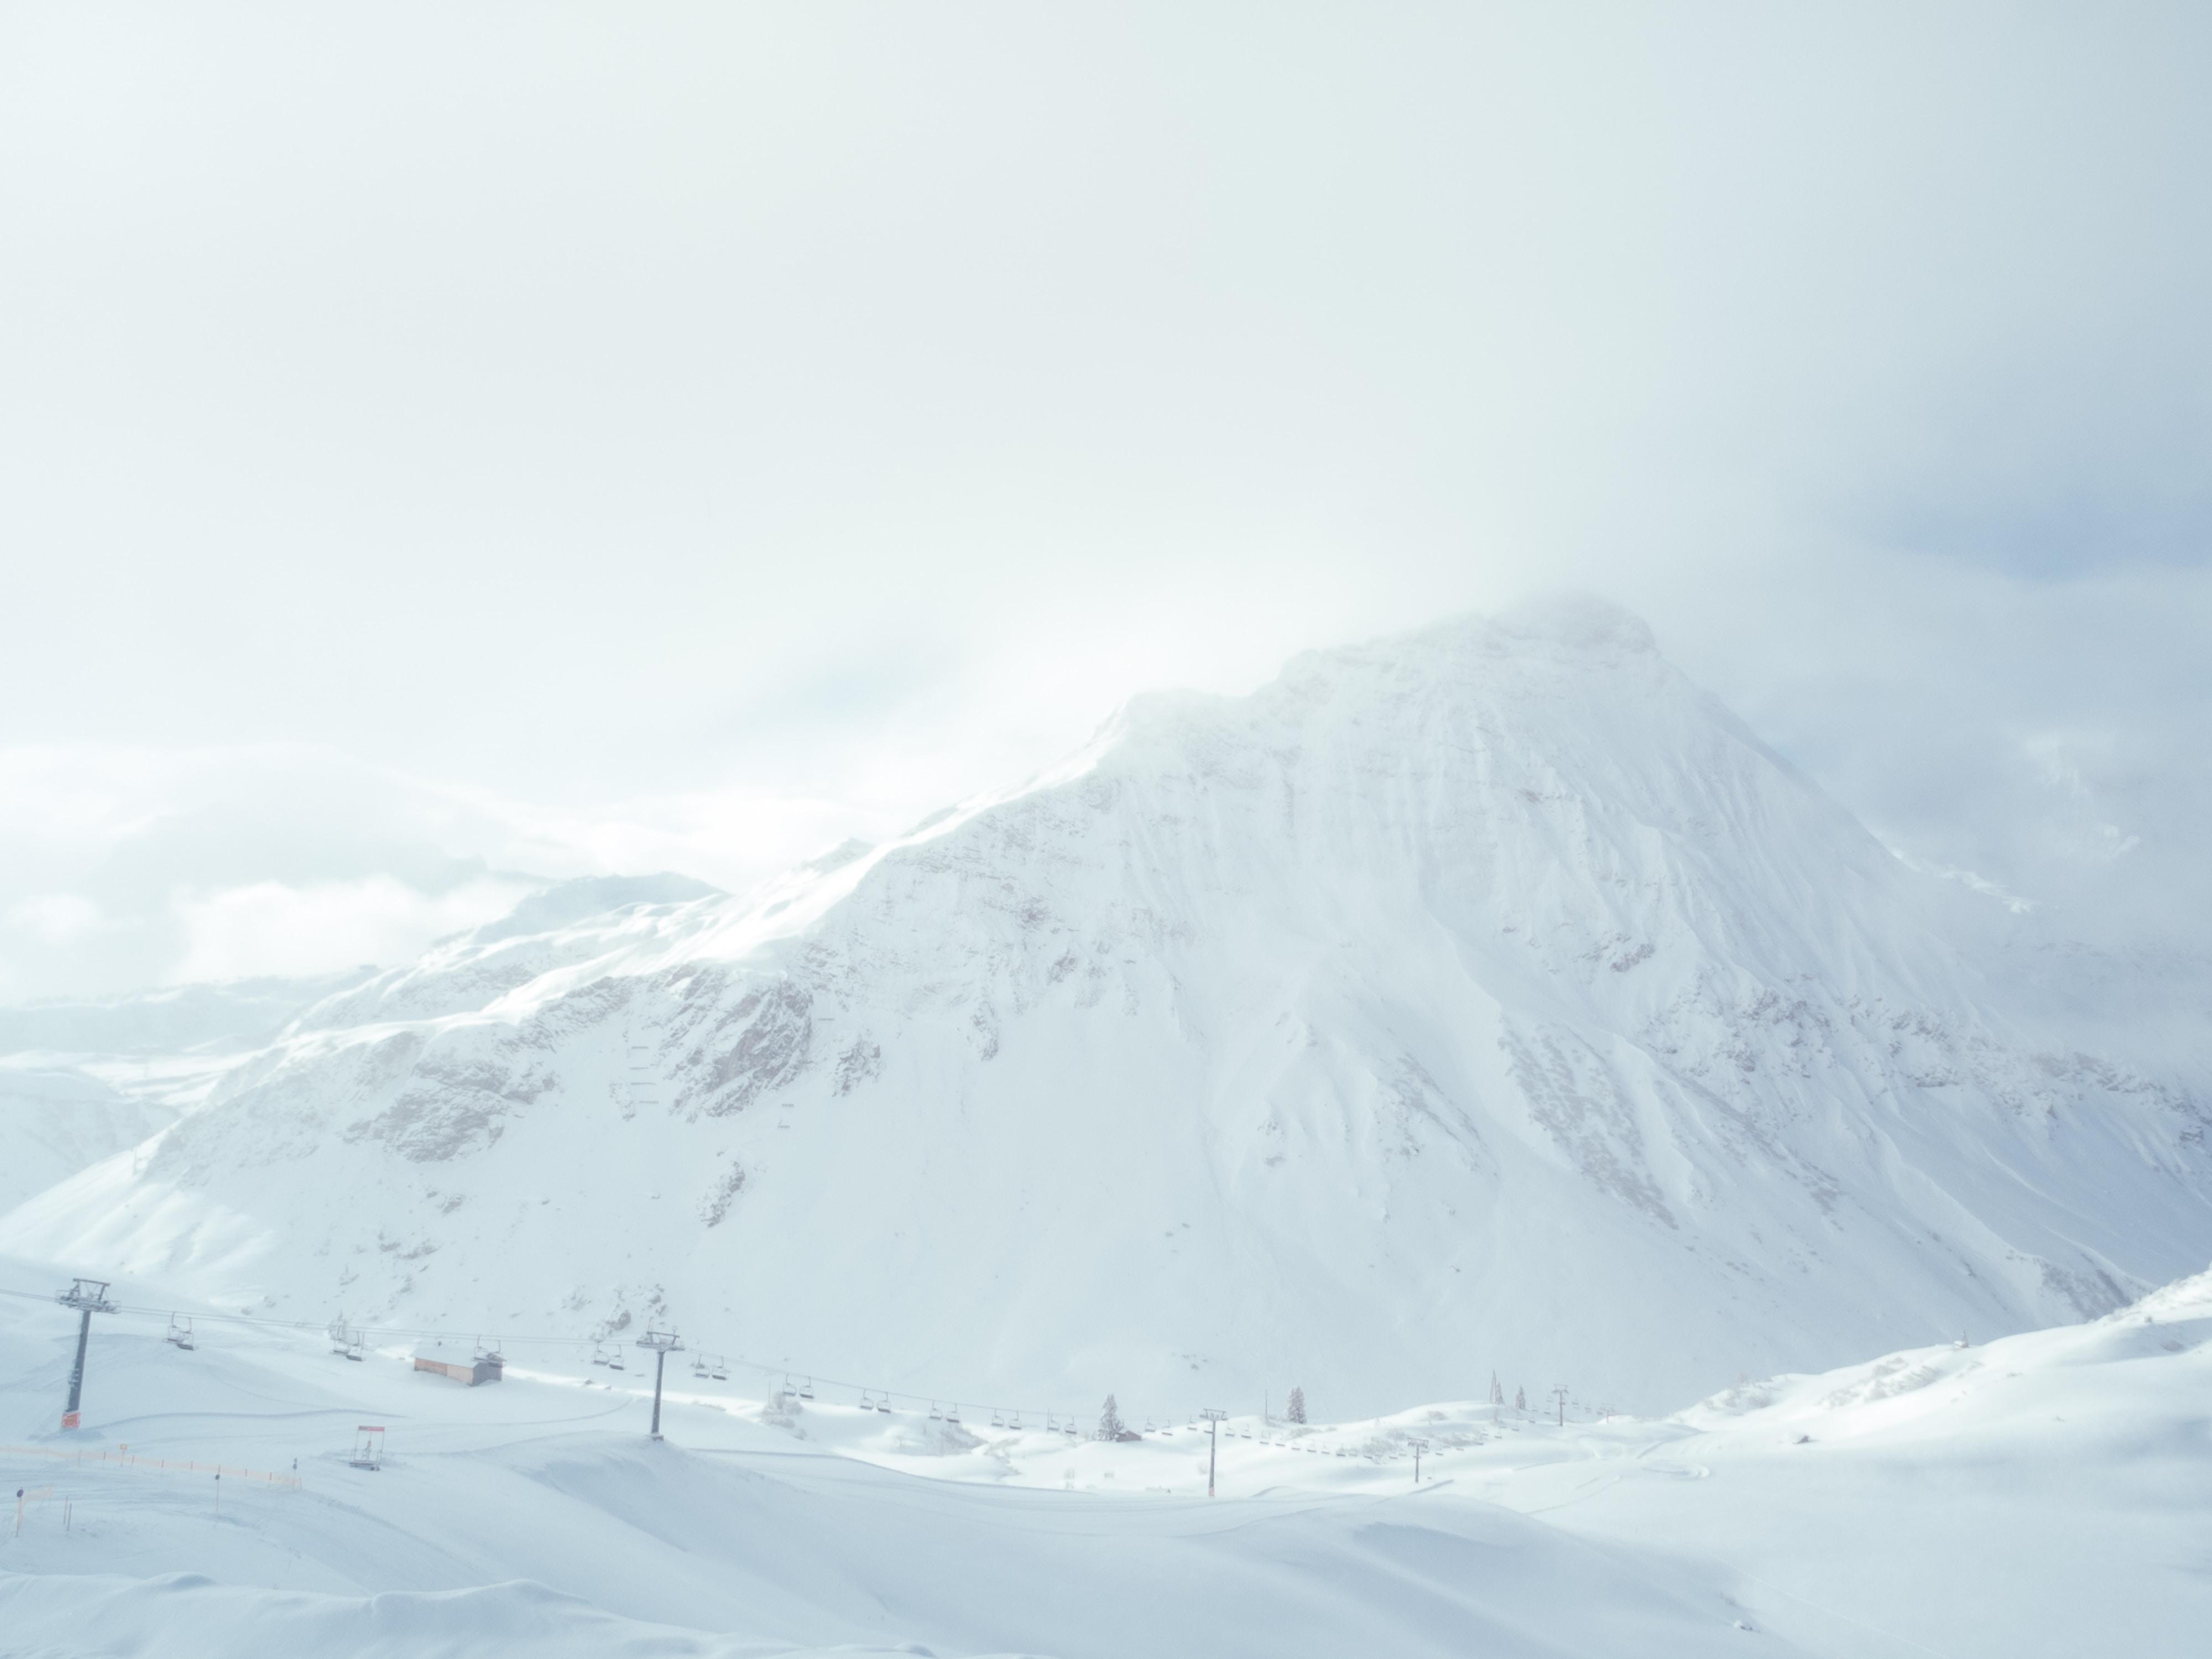 white mountain filled with snow under white sky